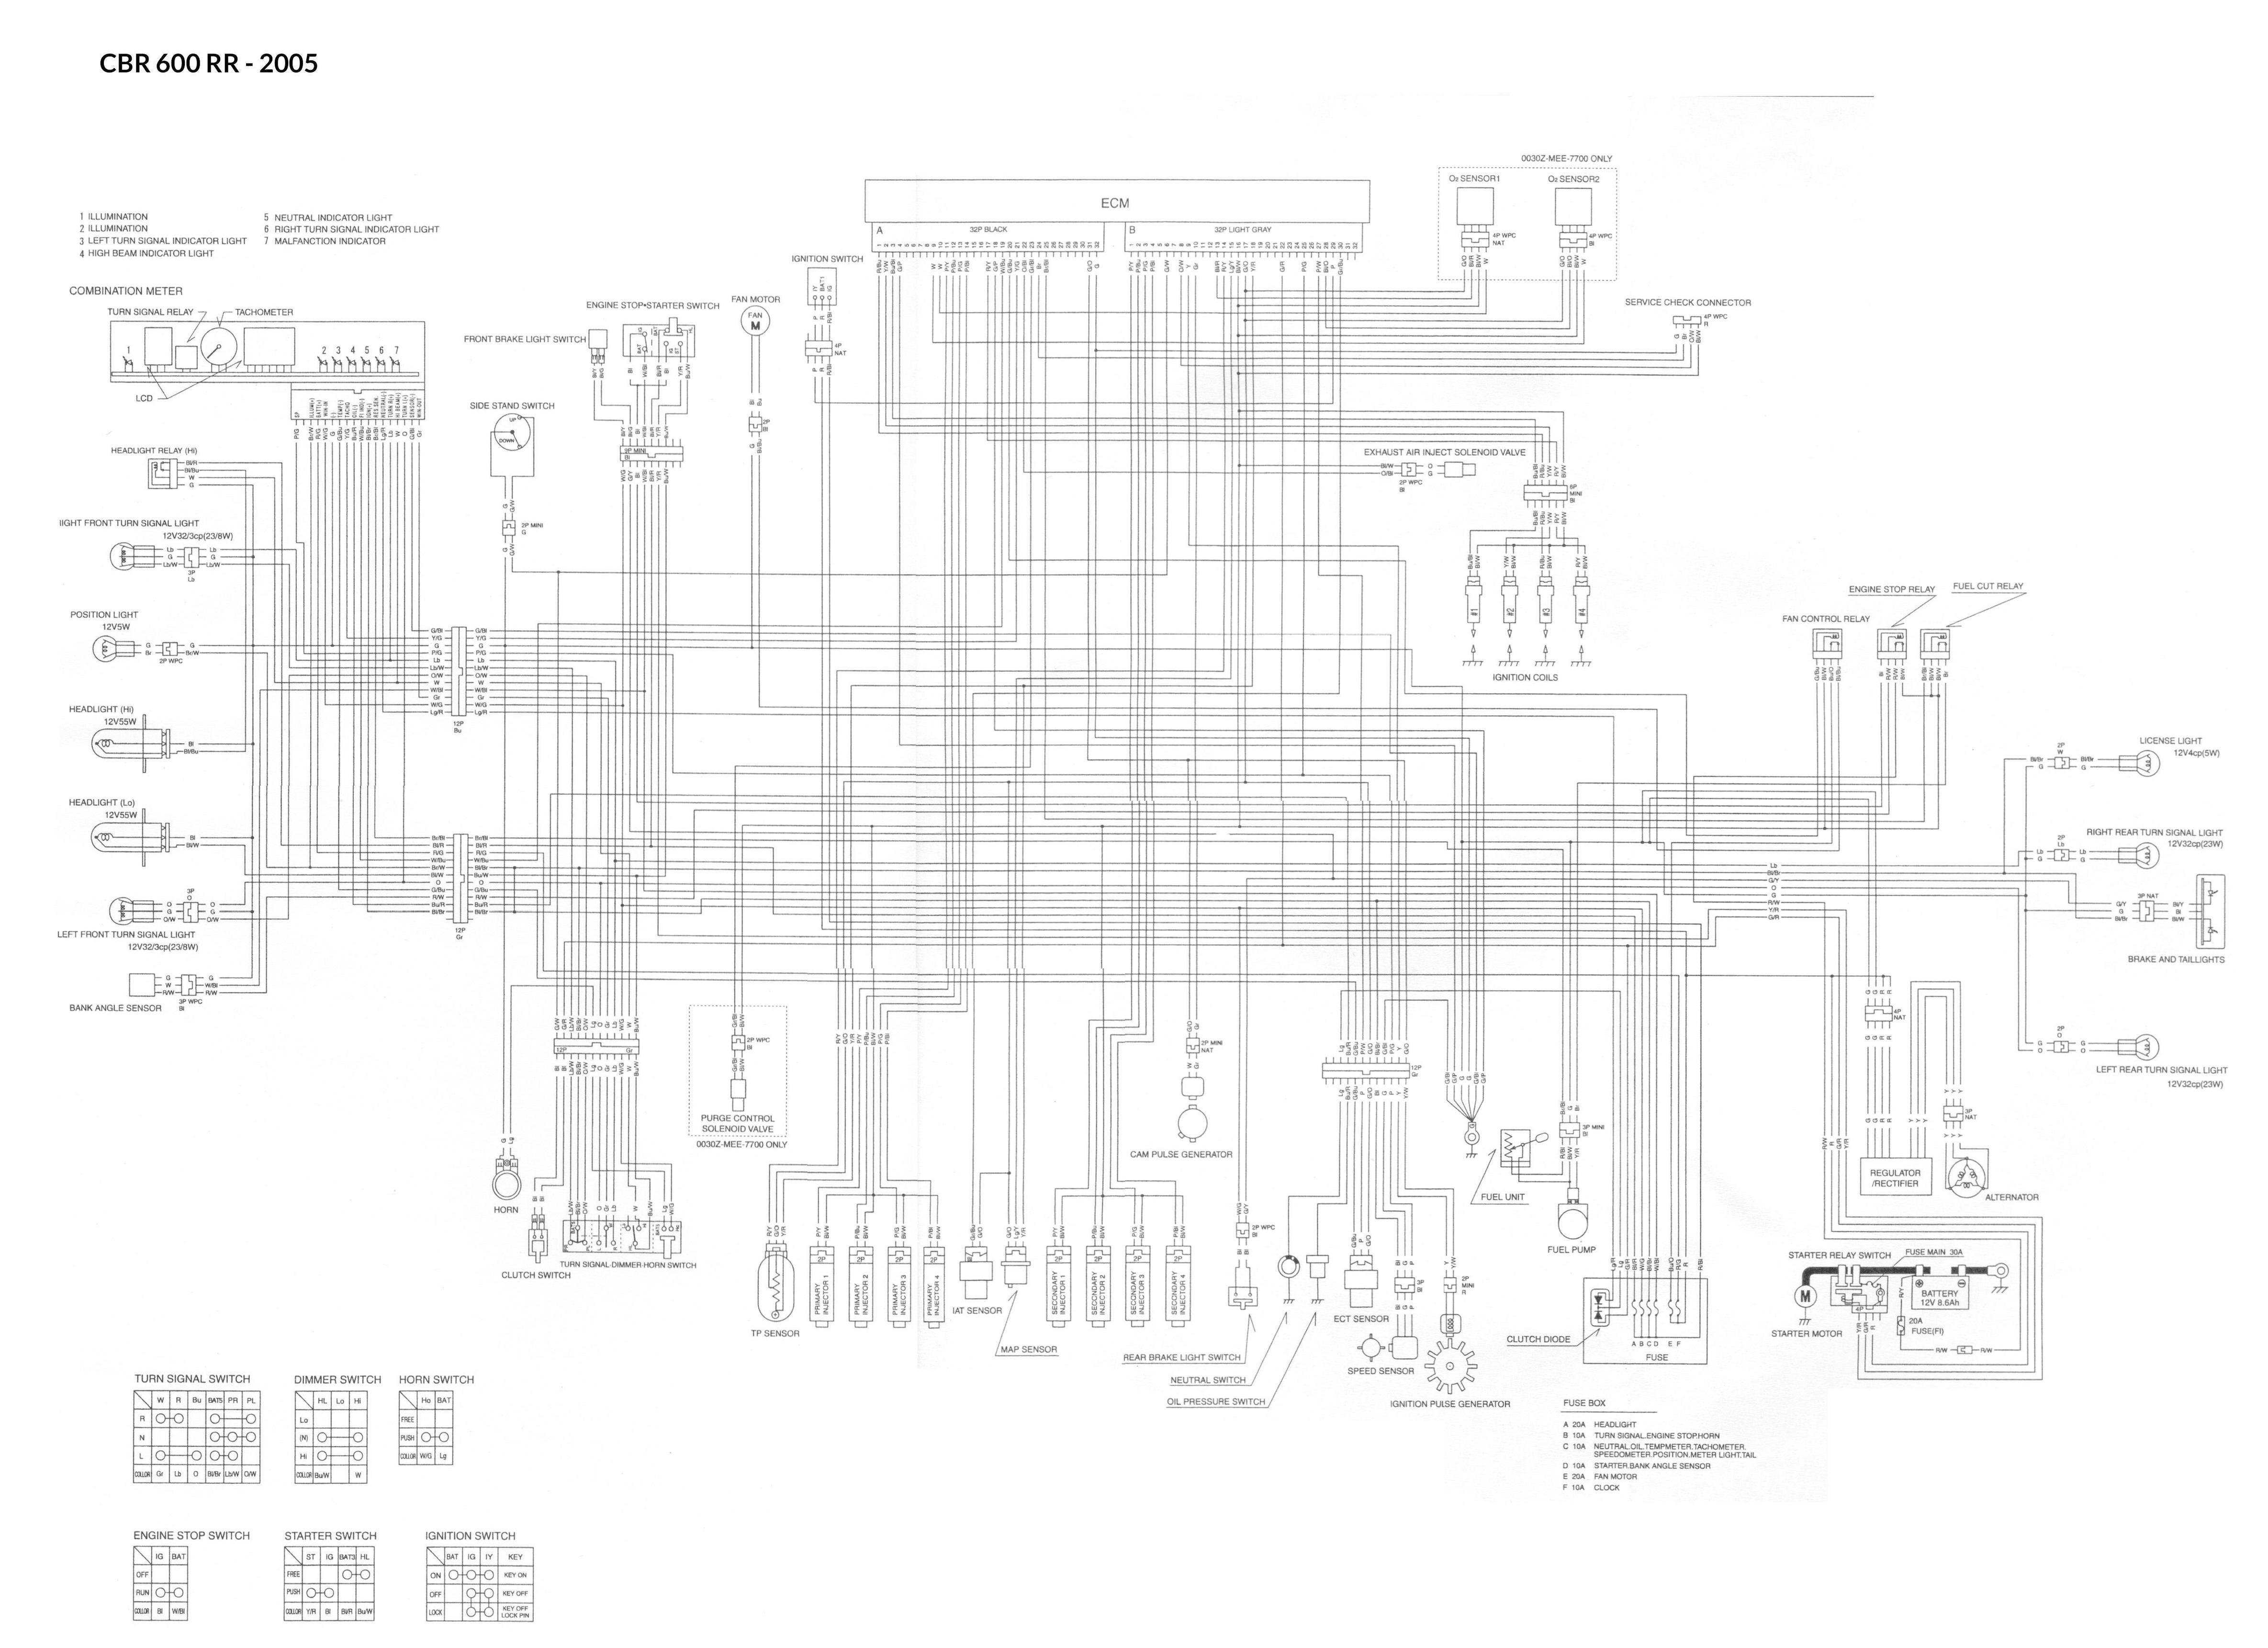 2012 Honda Cbr1000rr Wiring Diagram Wiring Diagram List Library List Library Saintclubmilano It